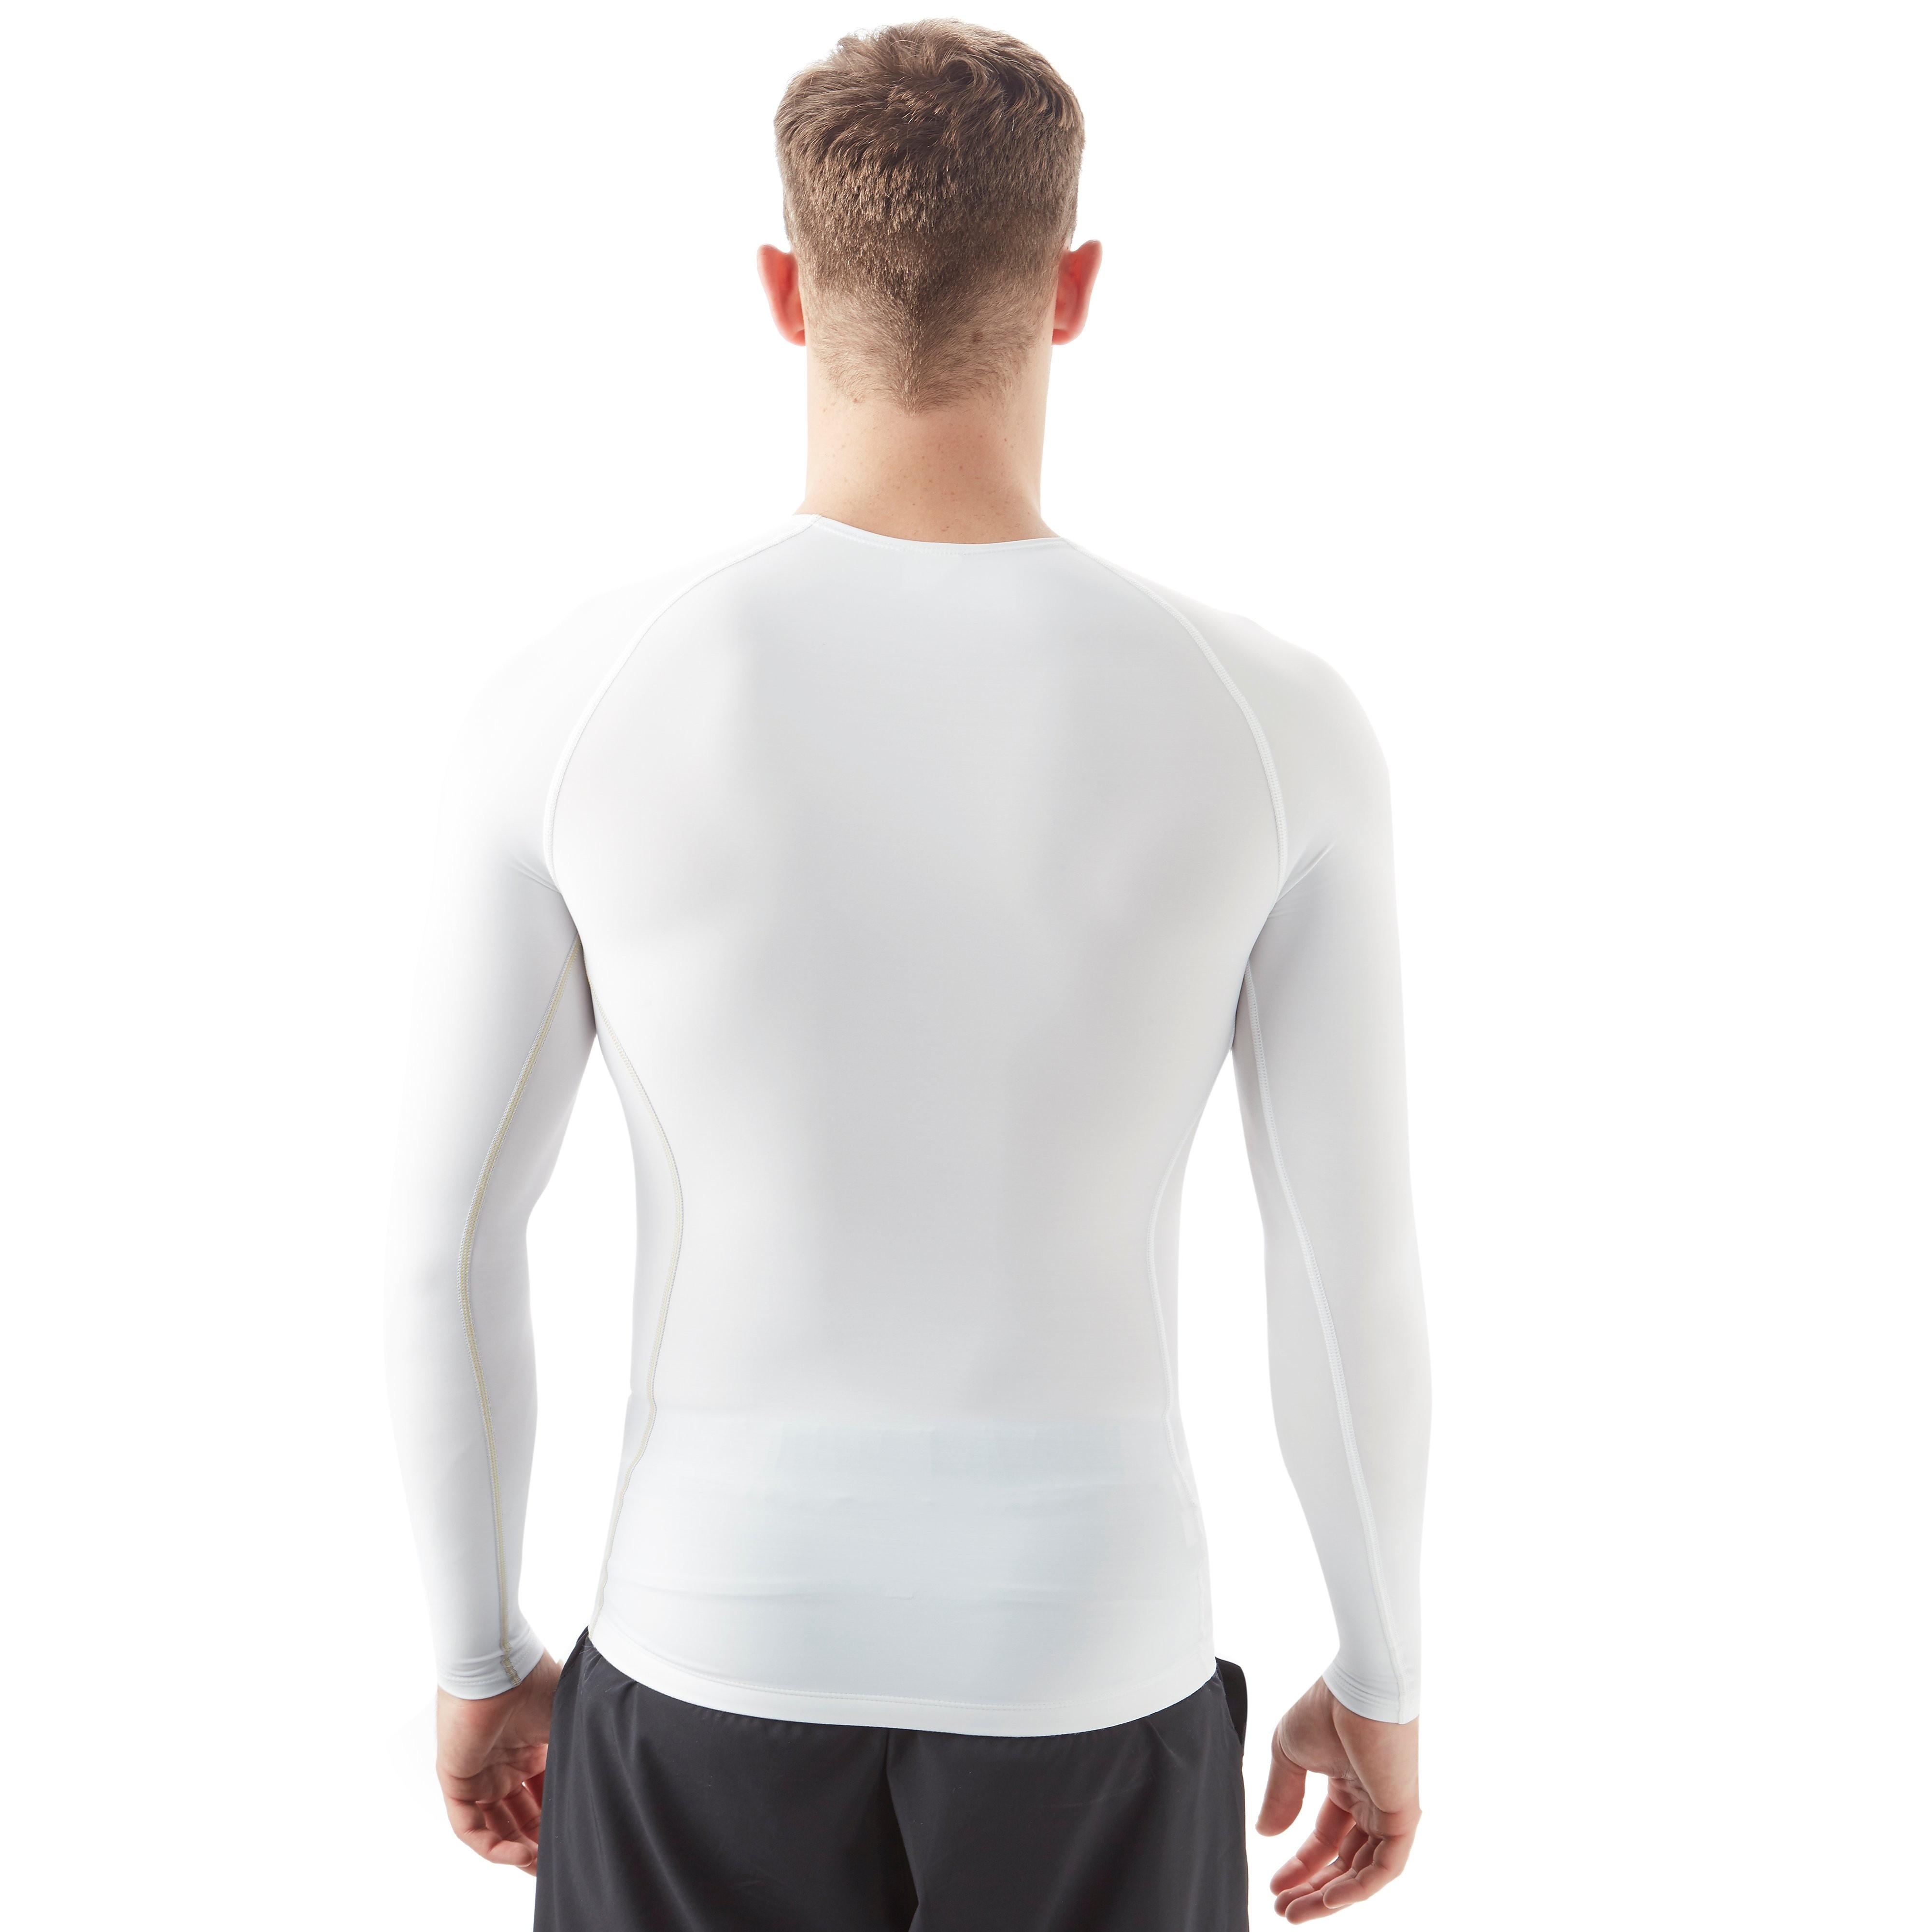 Skins DNAmic TEAM Thermal Long Sleeve Men's Running Top